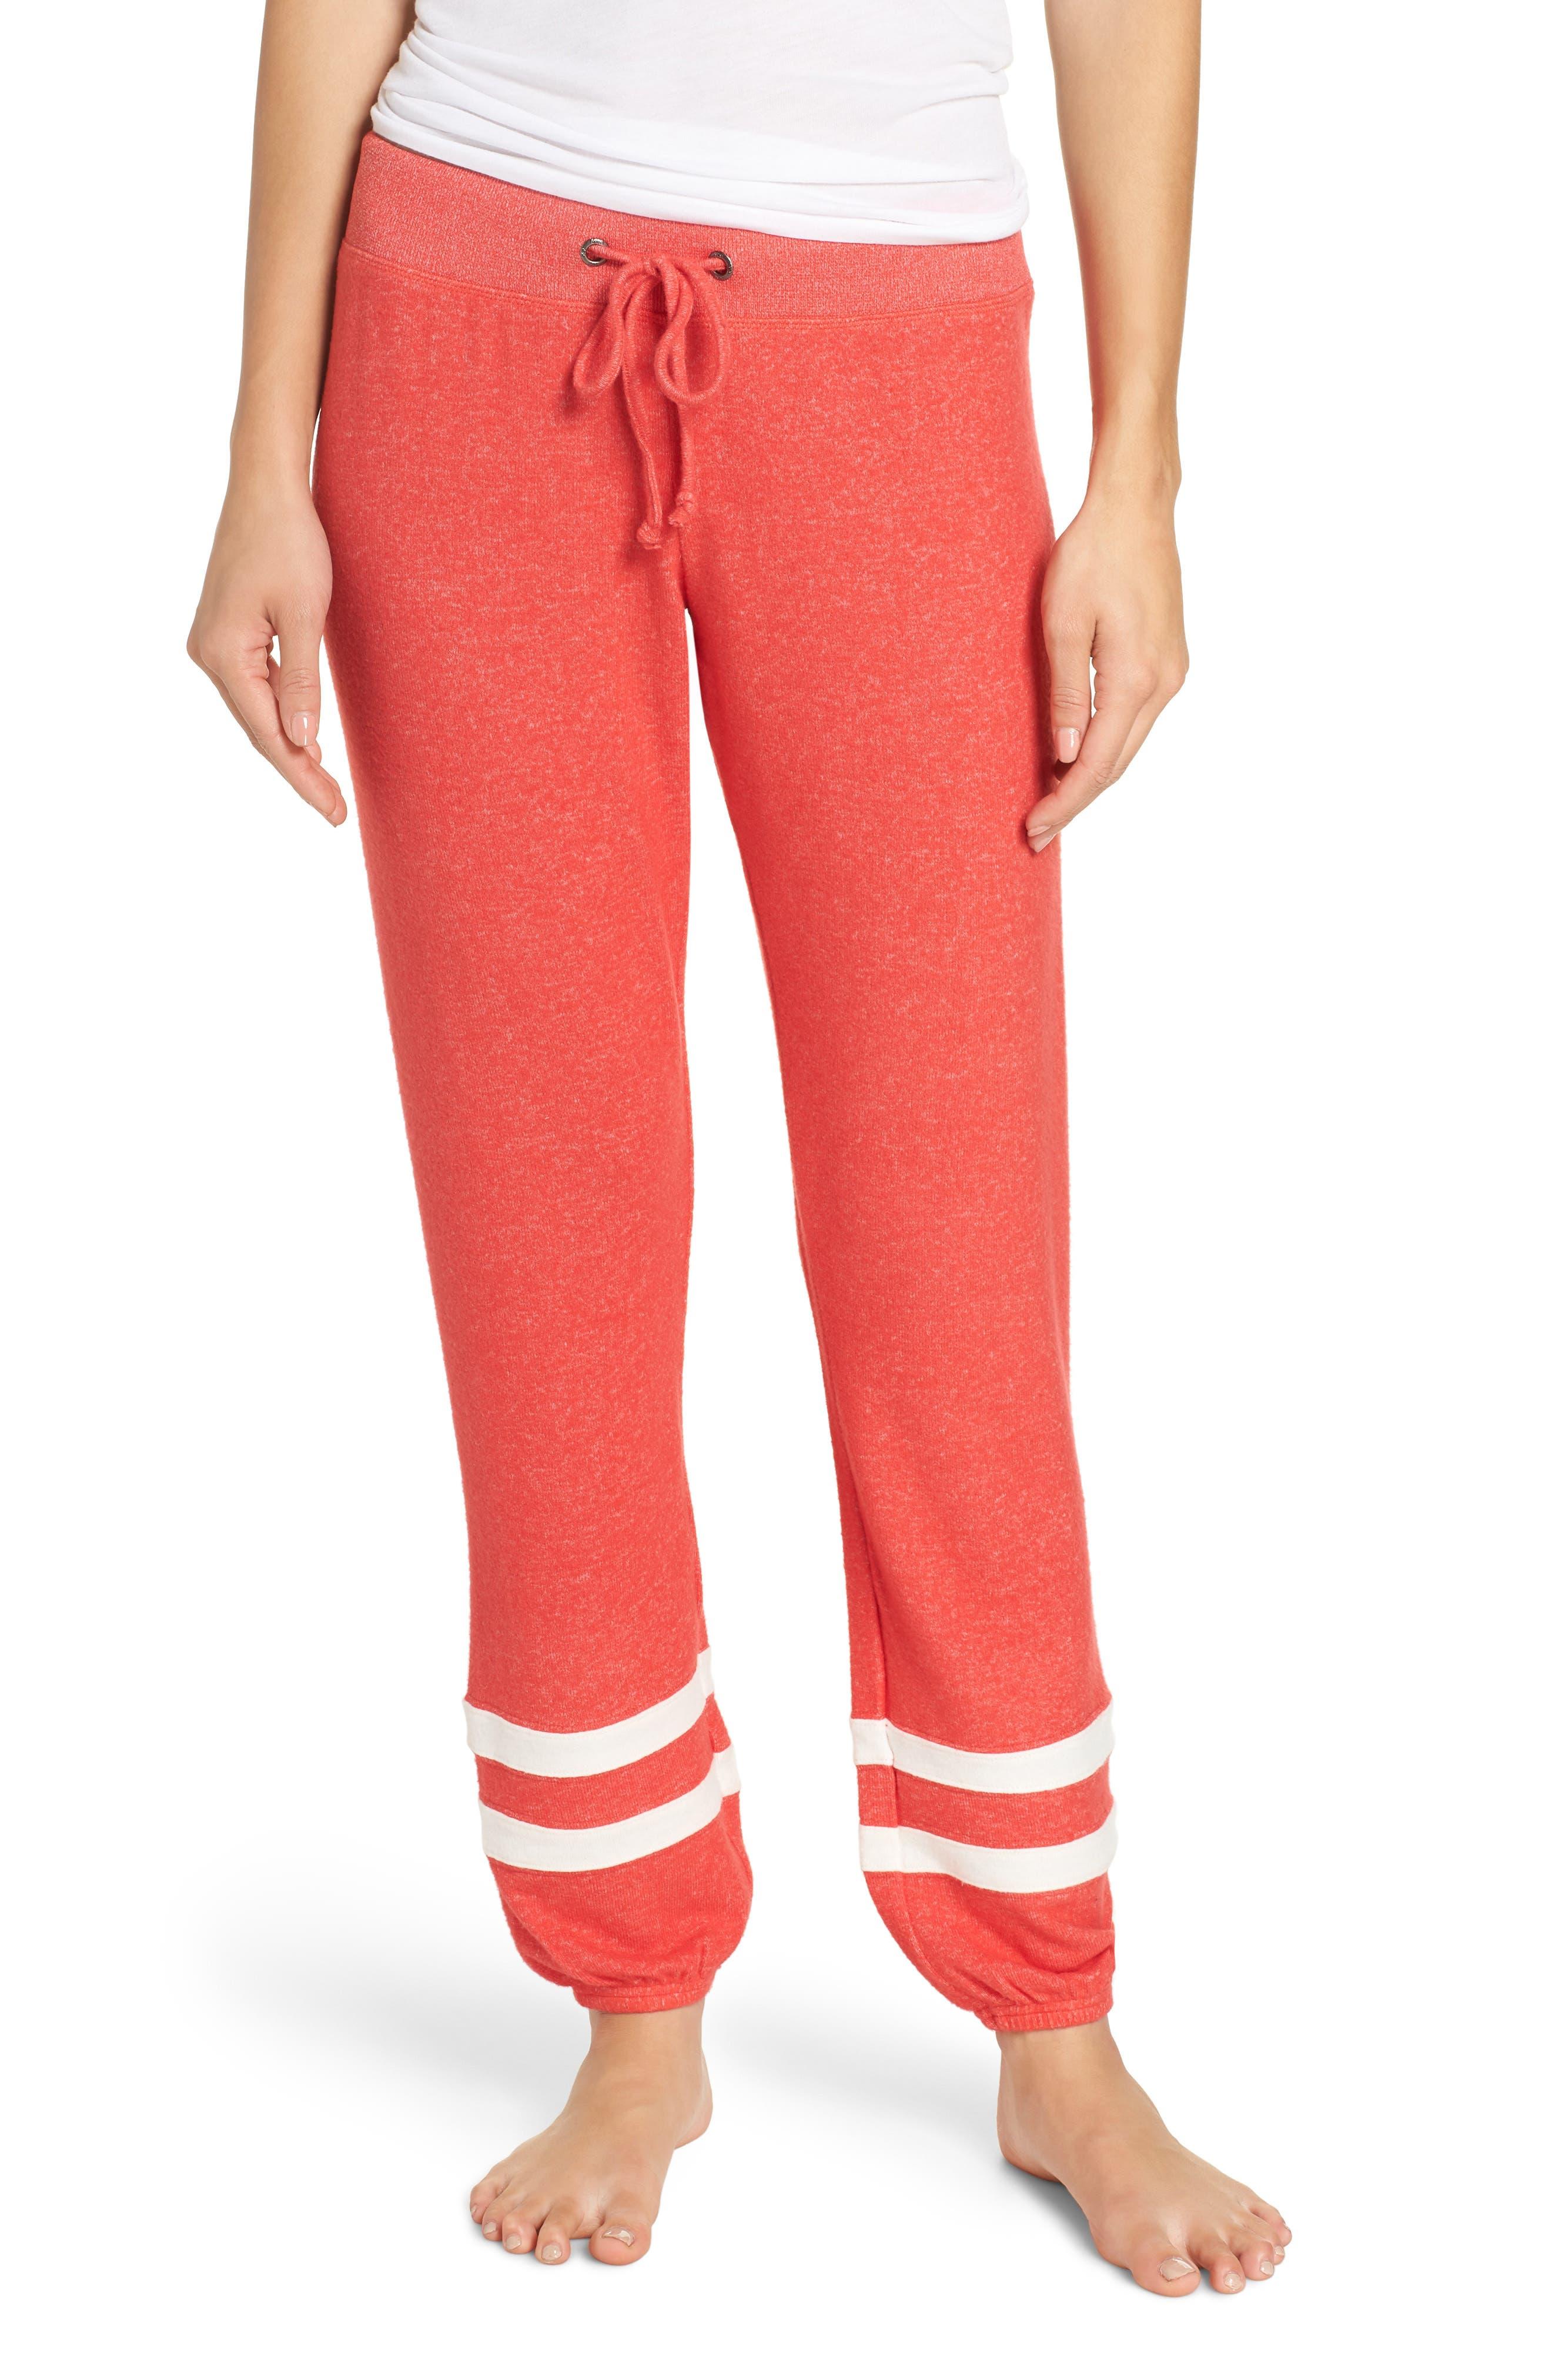 Good Vibes Jogger Pants,                         Main,                         color, RED TOMATO/ IVORY EGRET STRIPE